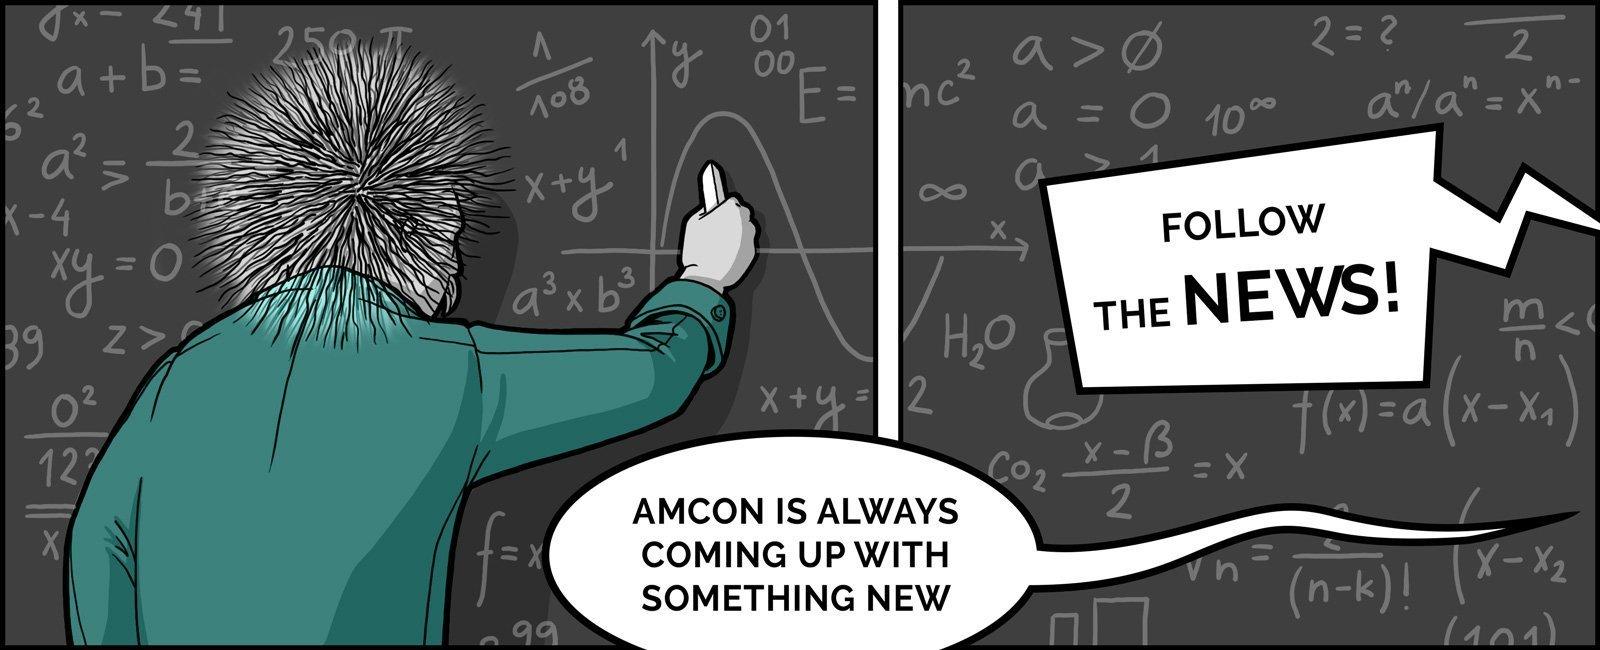 Amcon News, News, AMCON Europe s.r.o.